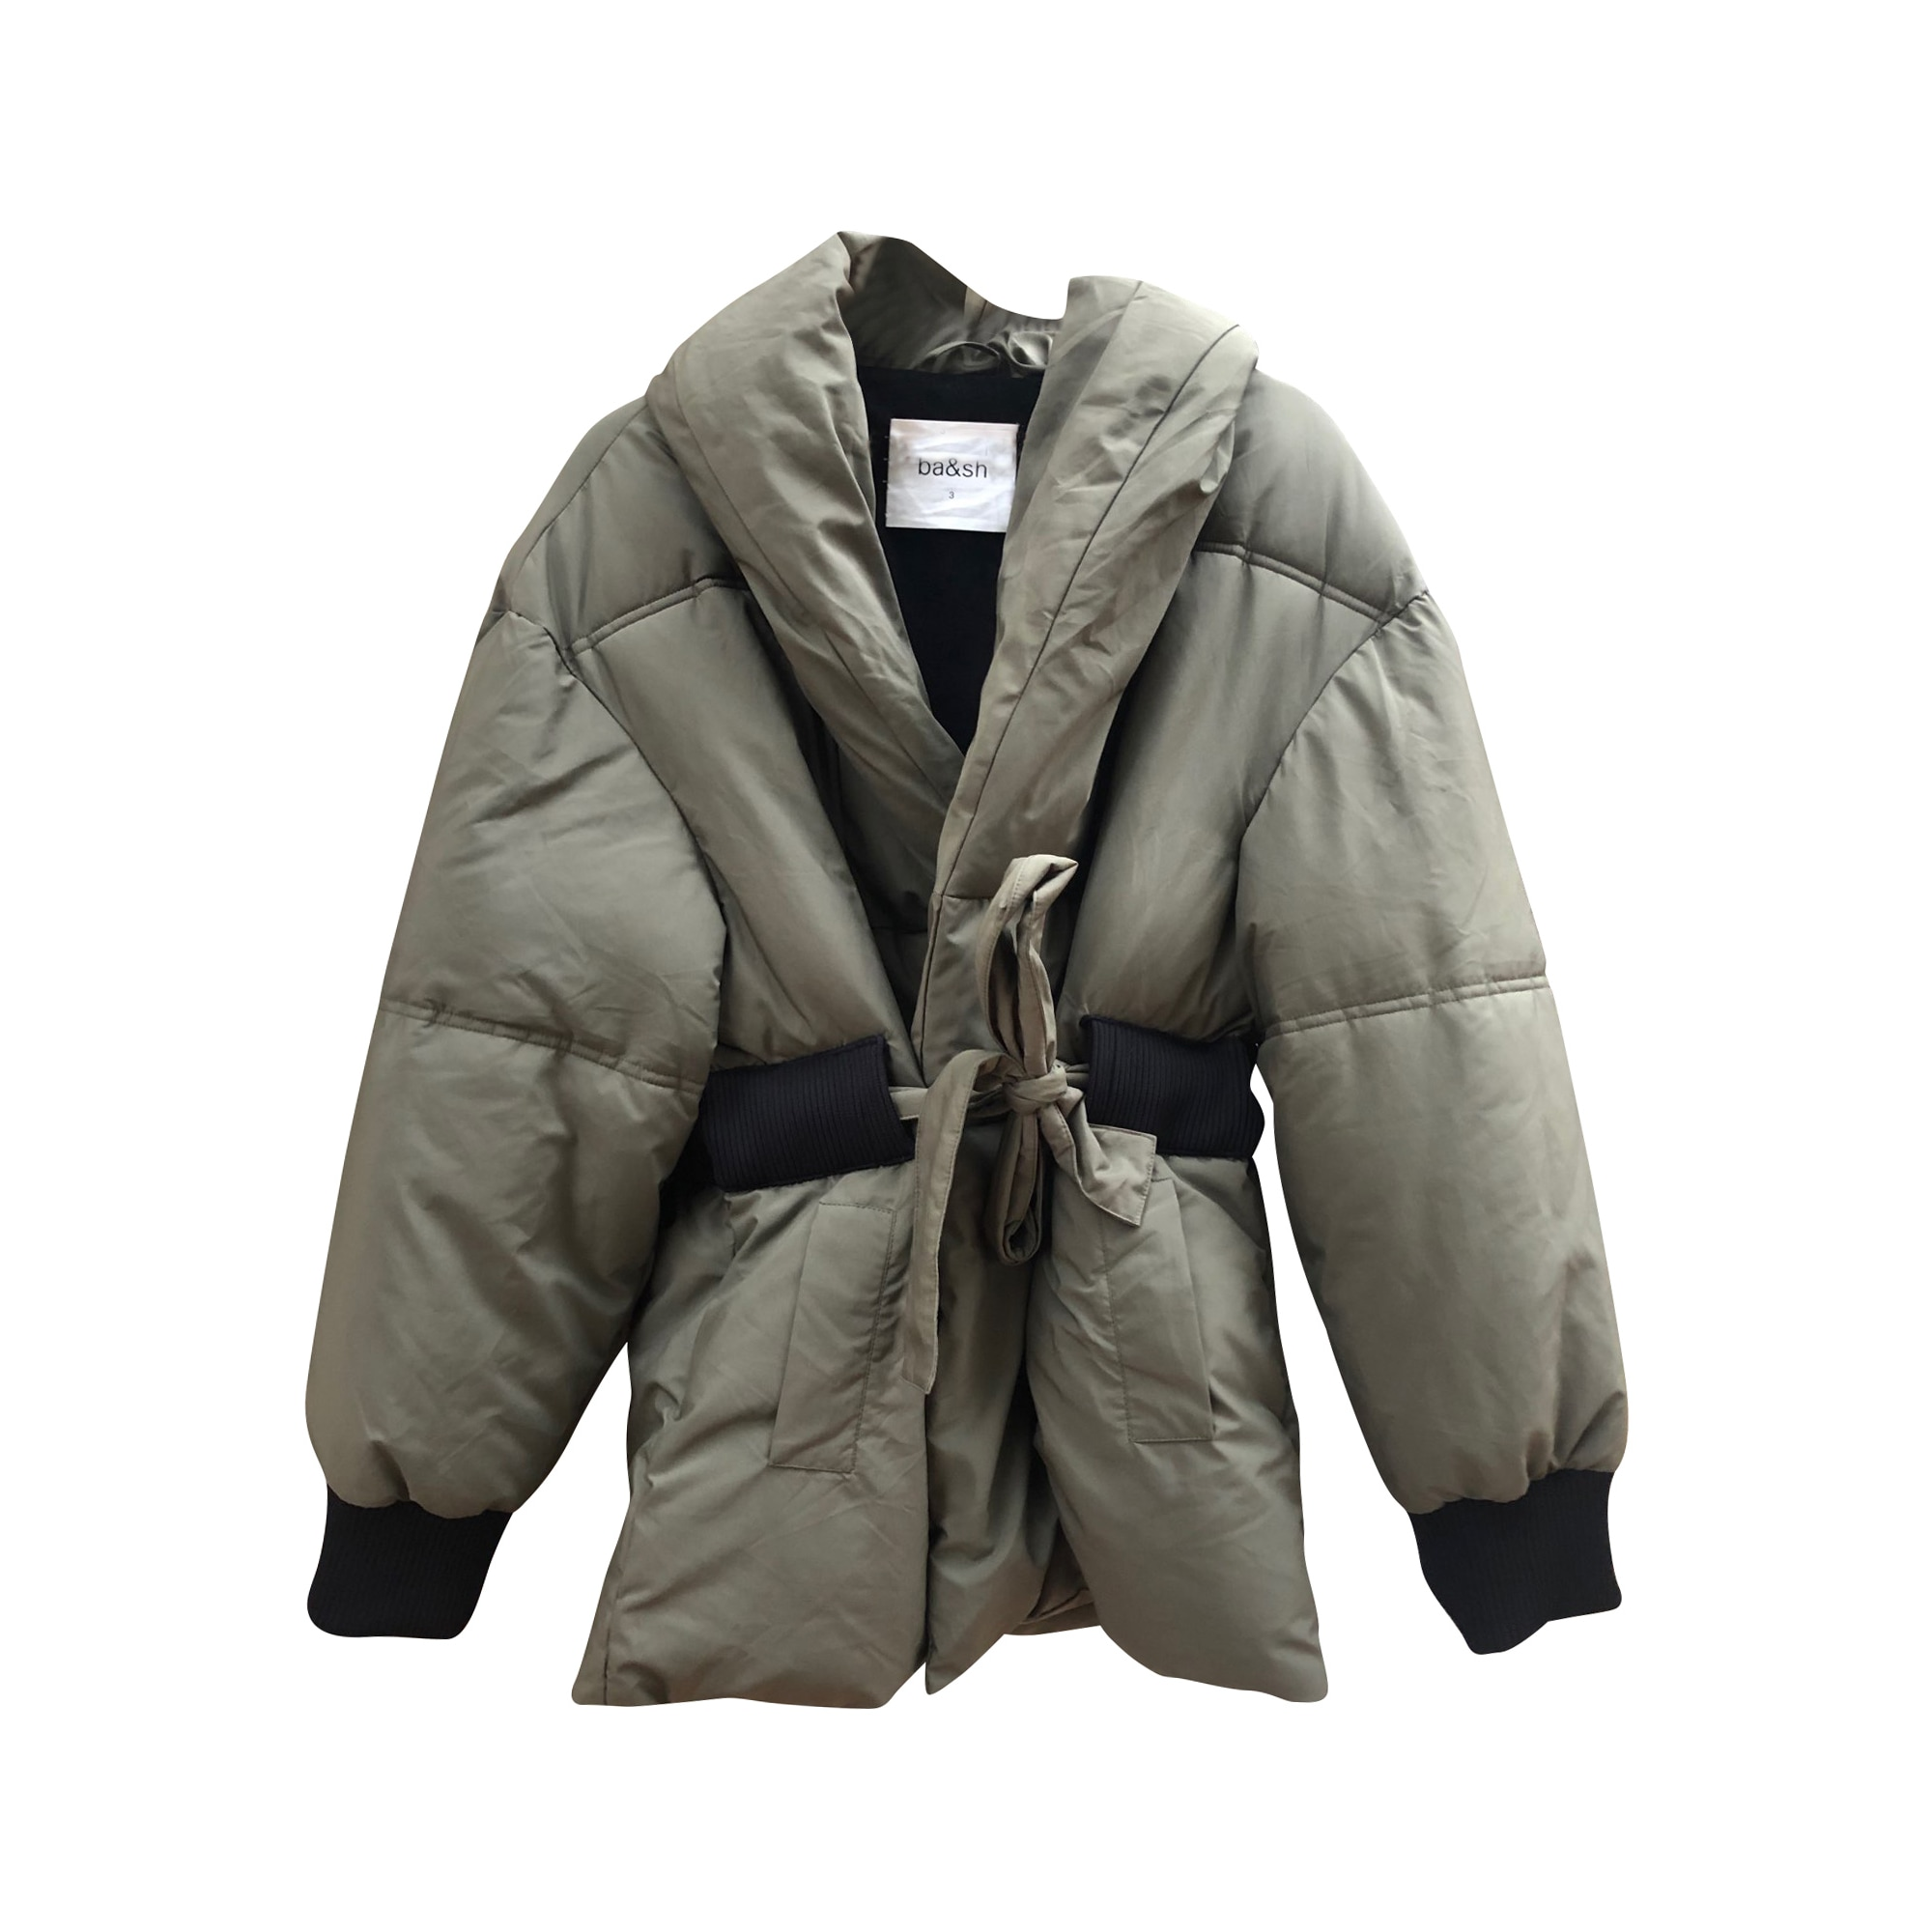 Down Jacket BA&SH Khaki